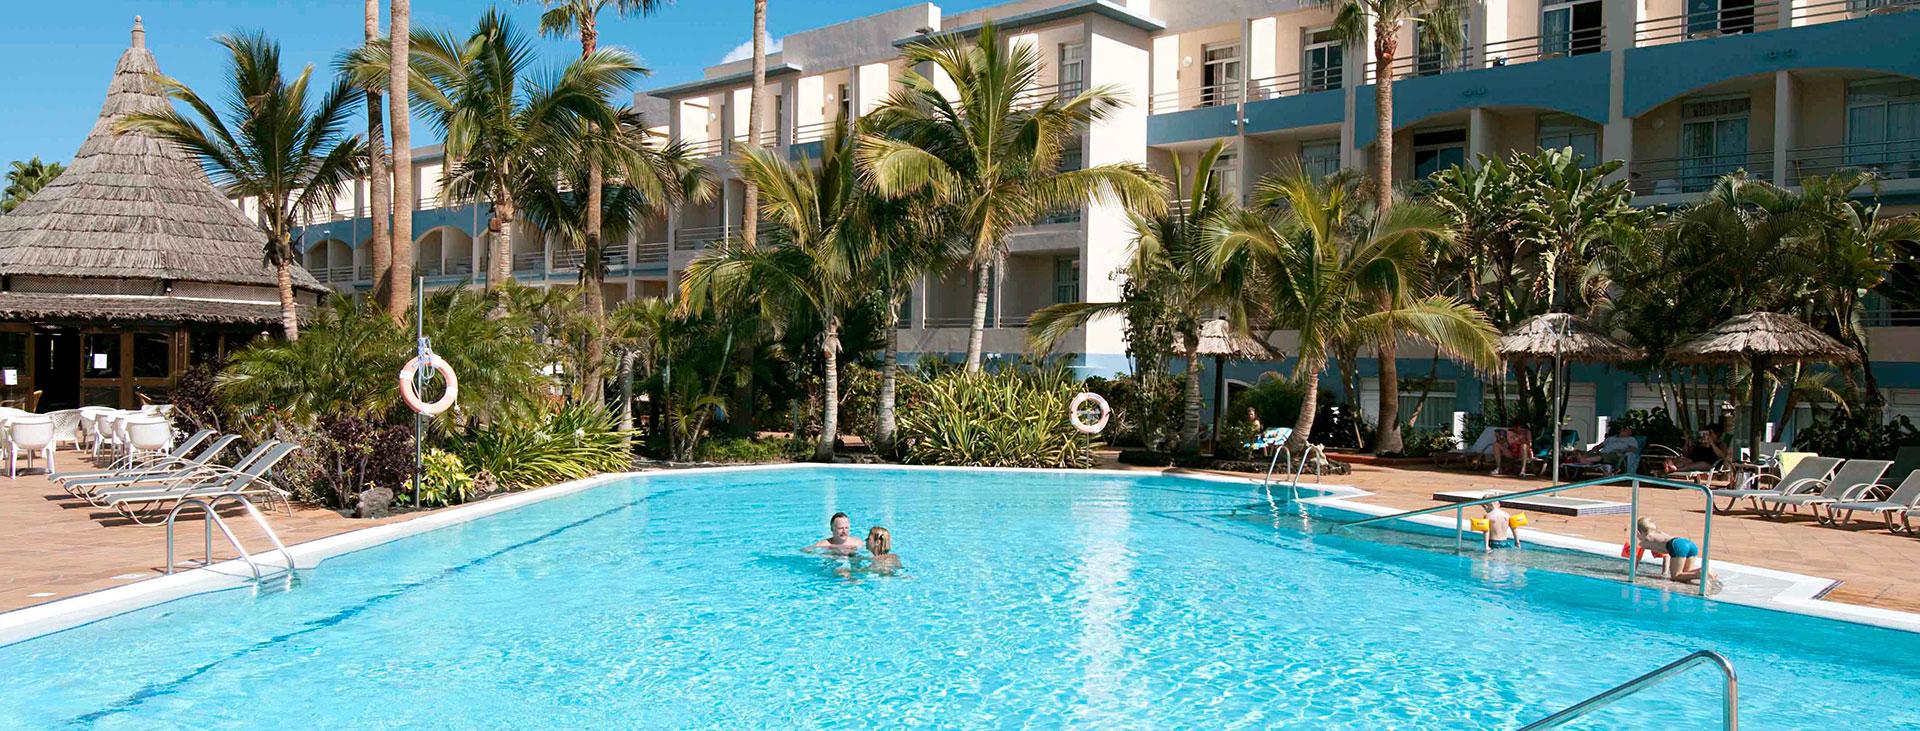 IFA Altamarena Hotel, Jandia, Fuerteventura, Kanariøyene